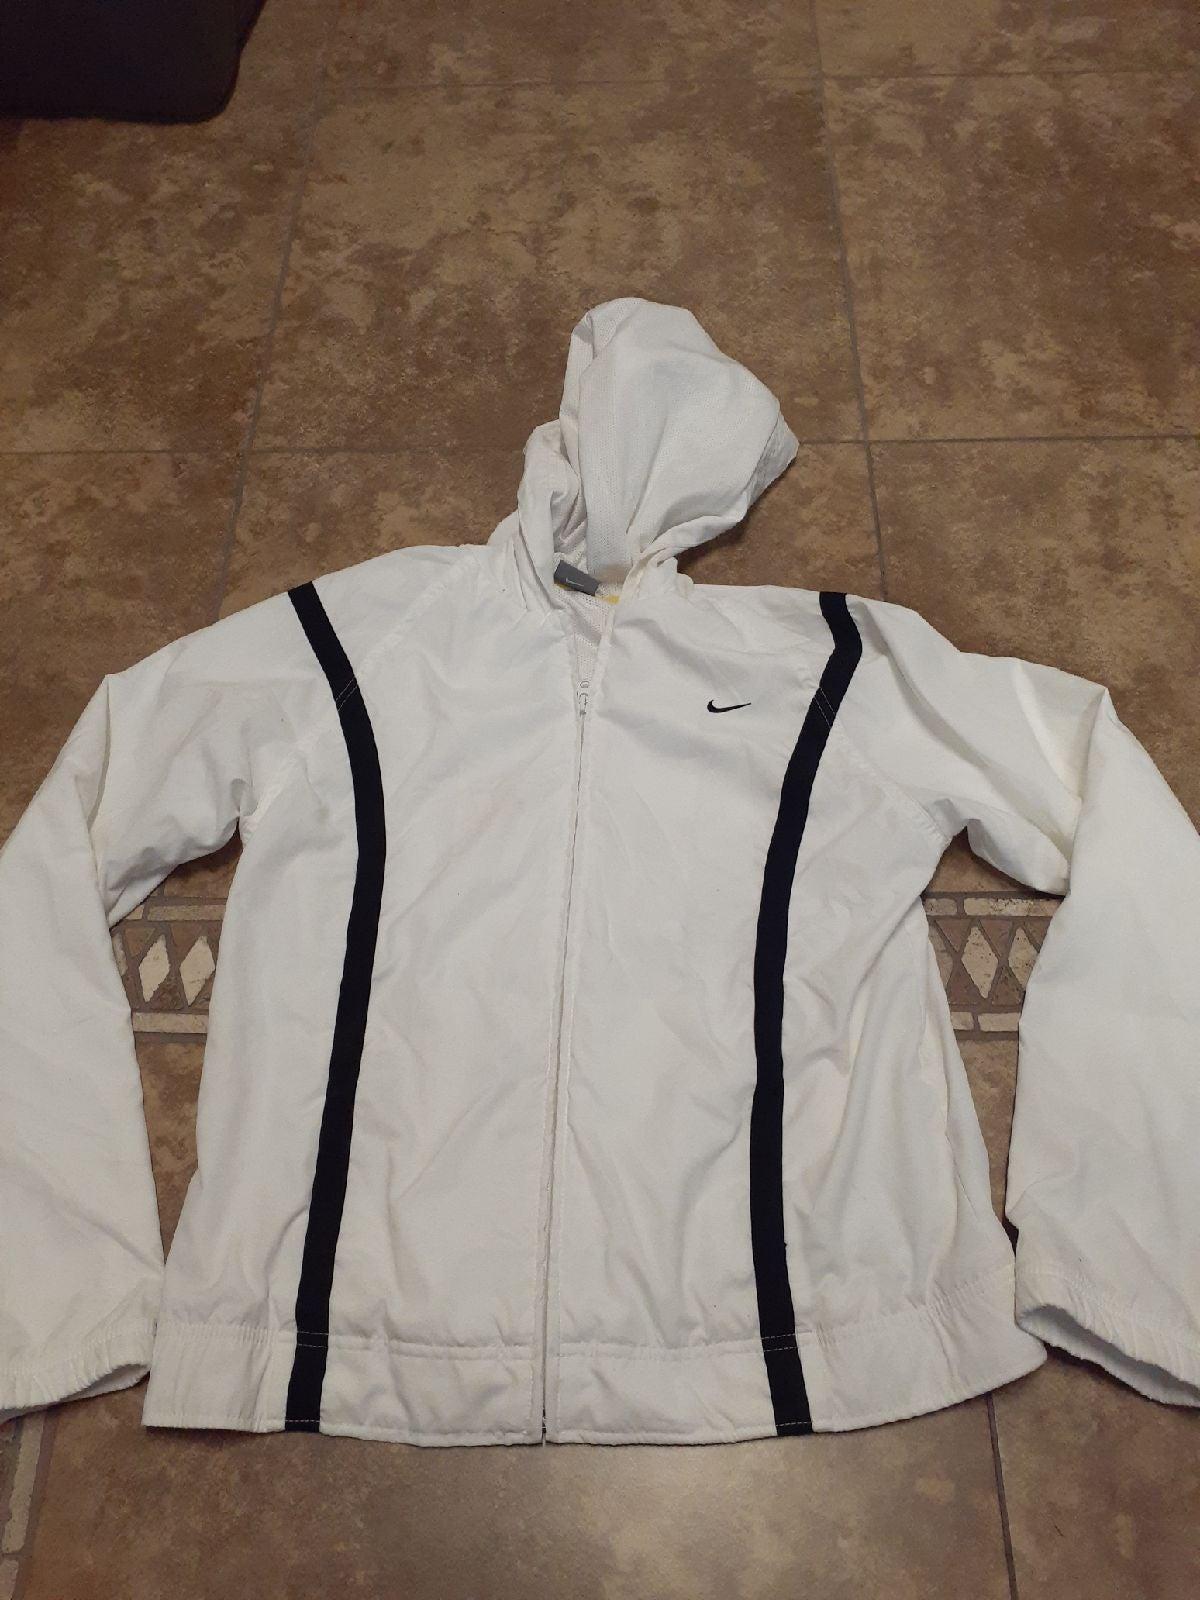 Nike Hood Jacket Womens, Size M